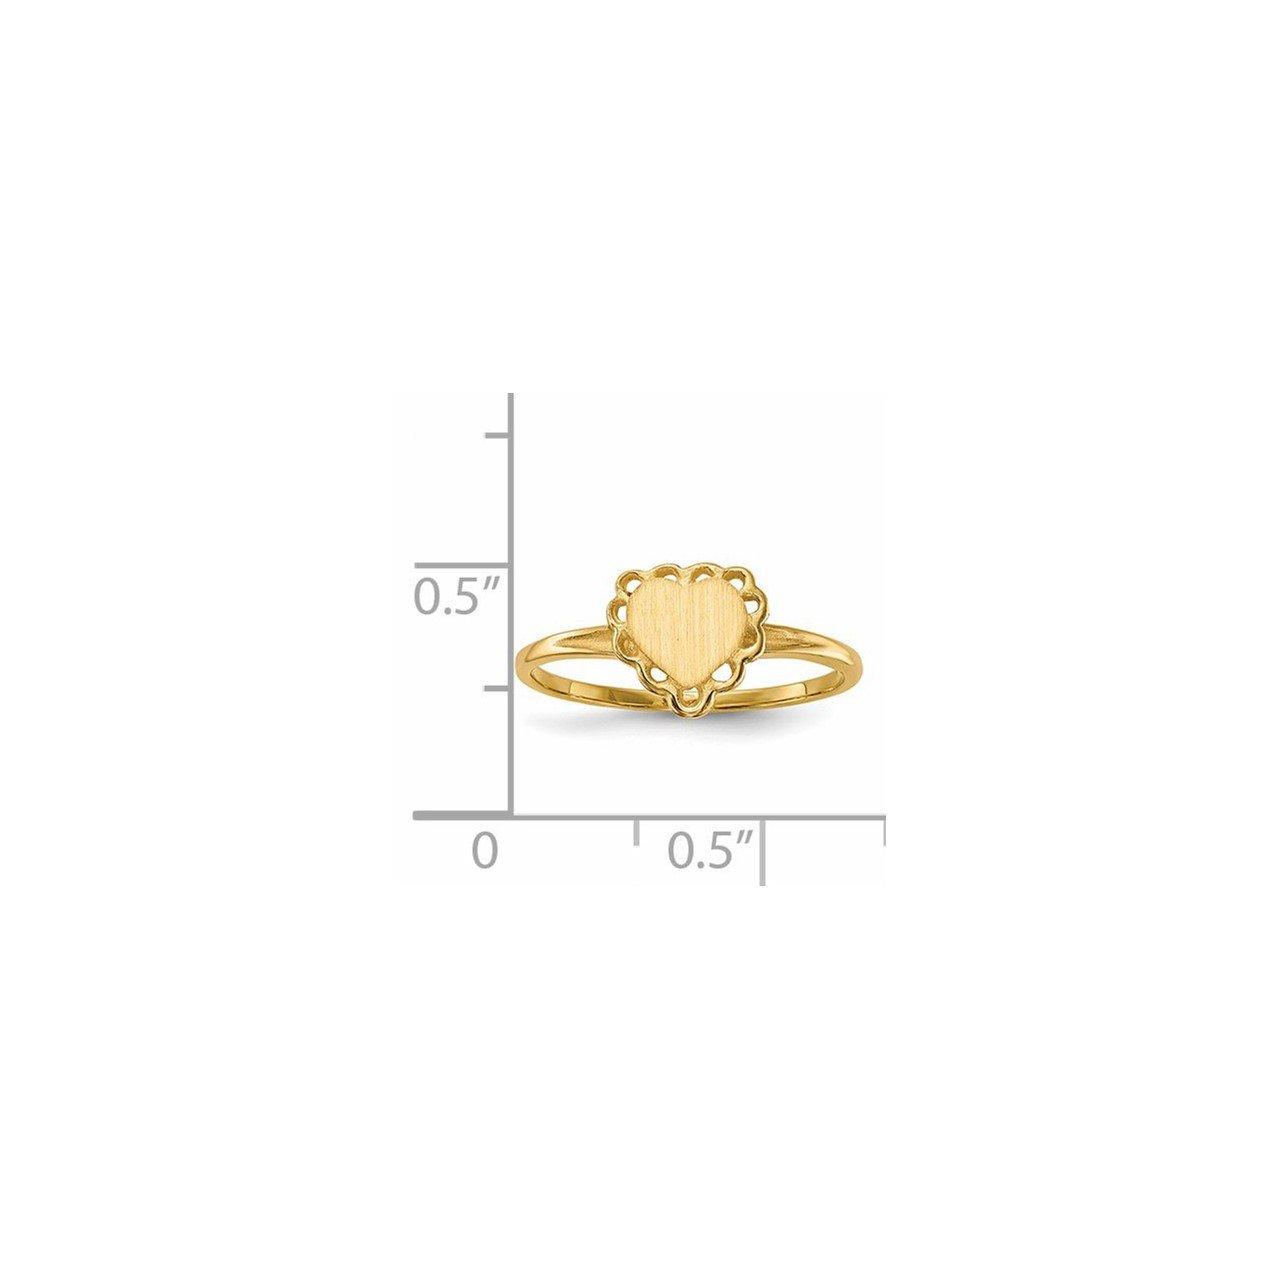 14k 6.0x6.5mm Open Back Heart Signet Ring-4